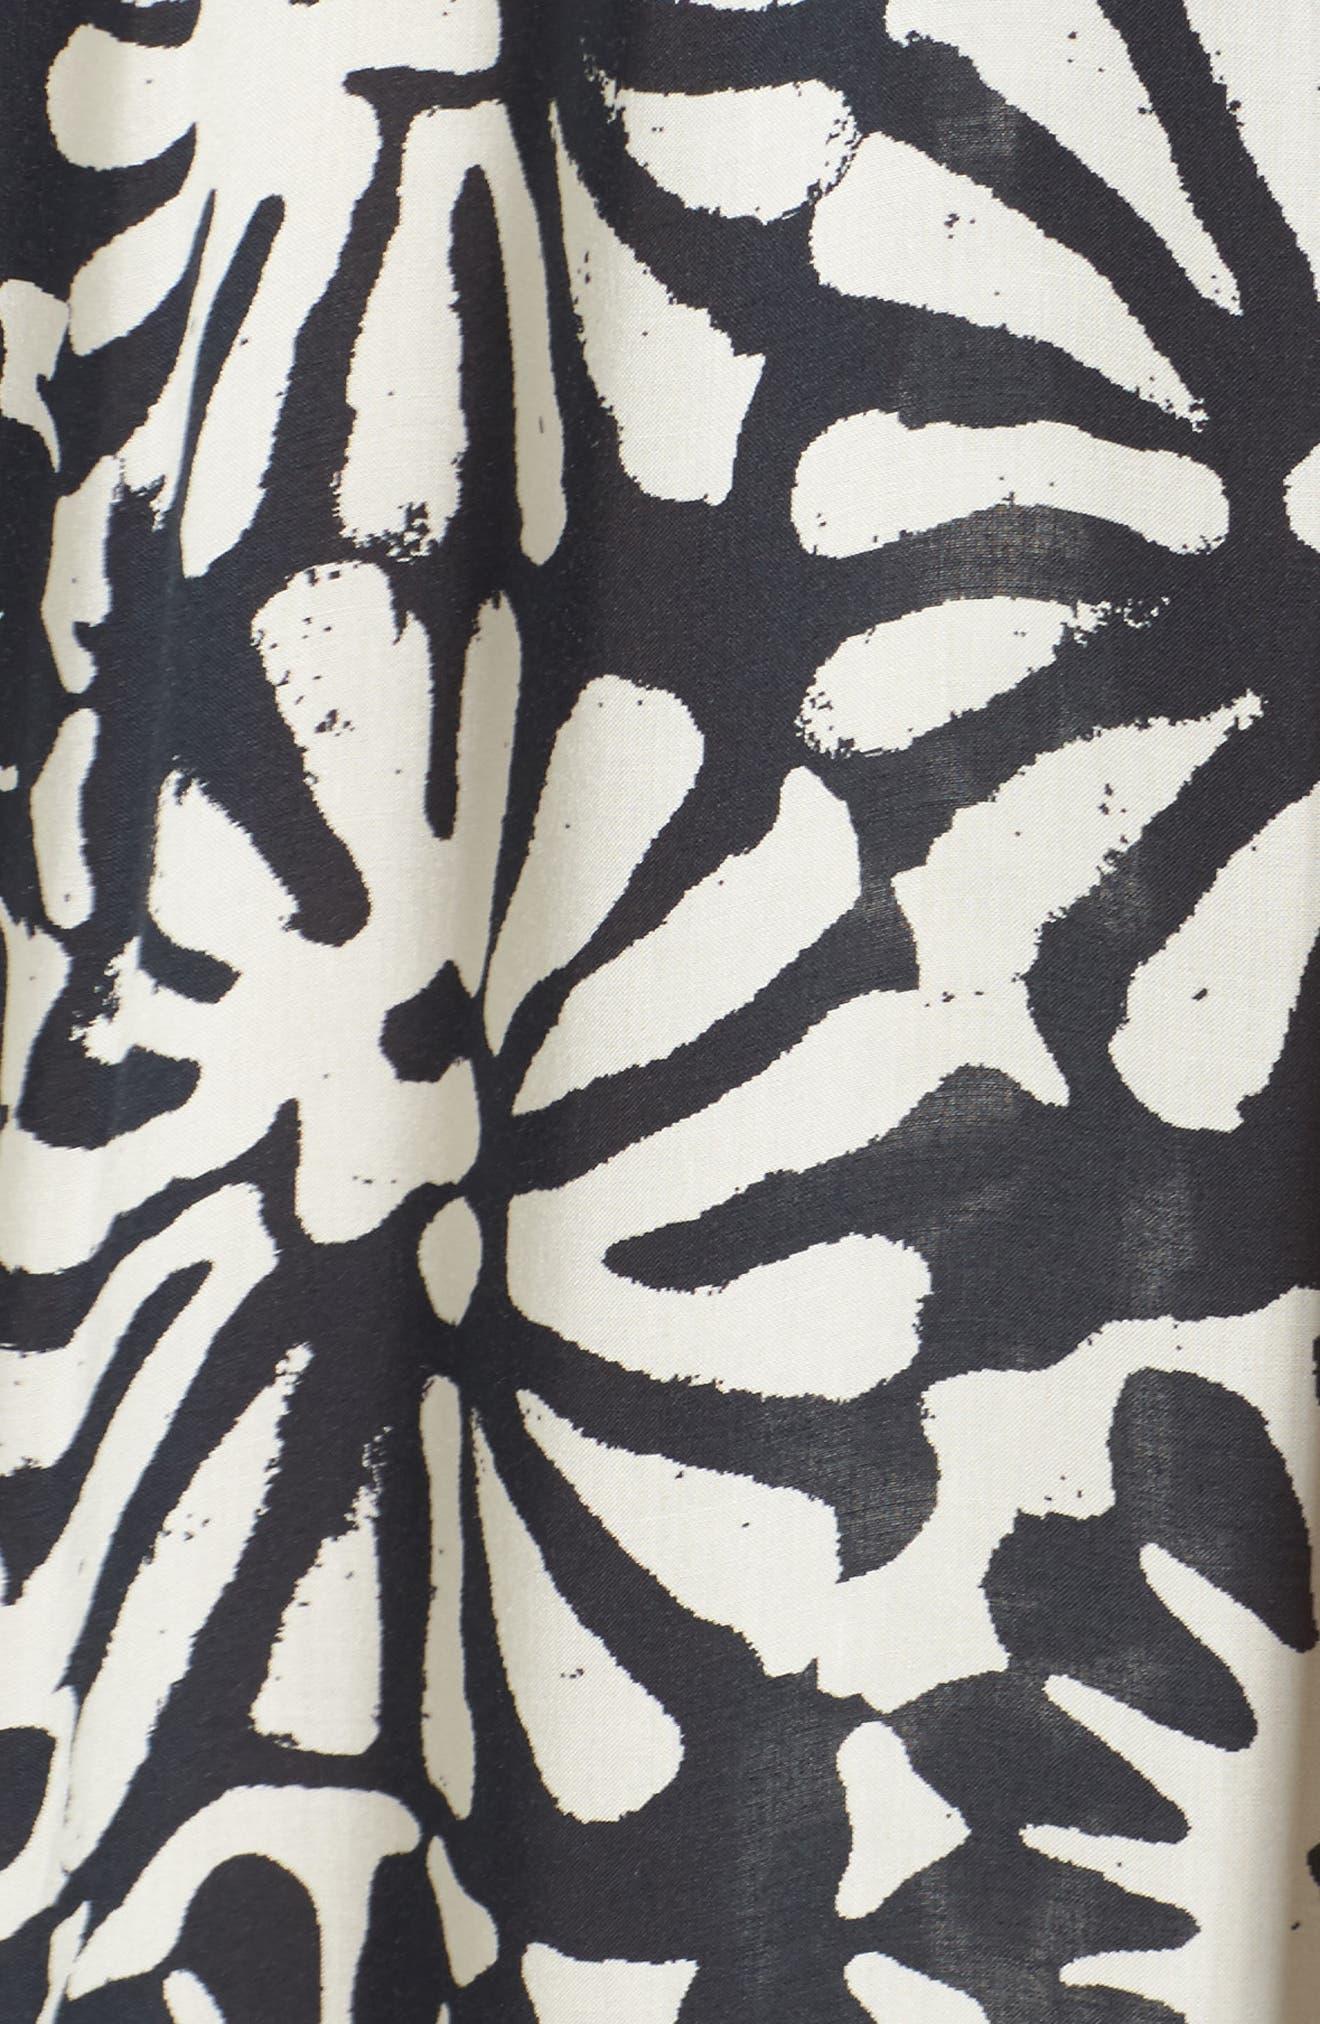 Pomelo Floral Cover-Up Dress,                             Alternate thumbnail 5, color,